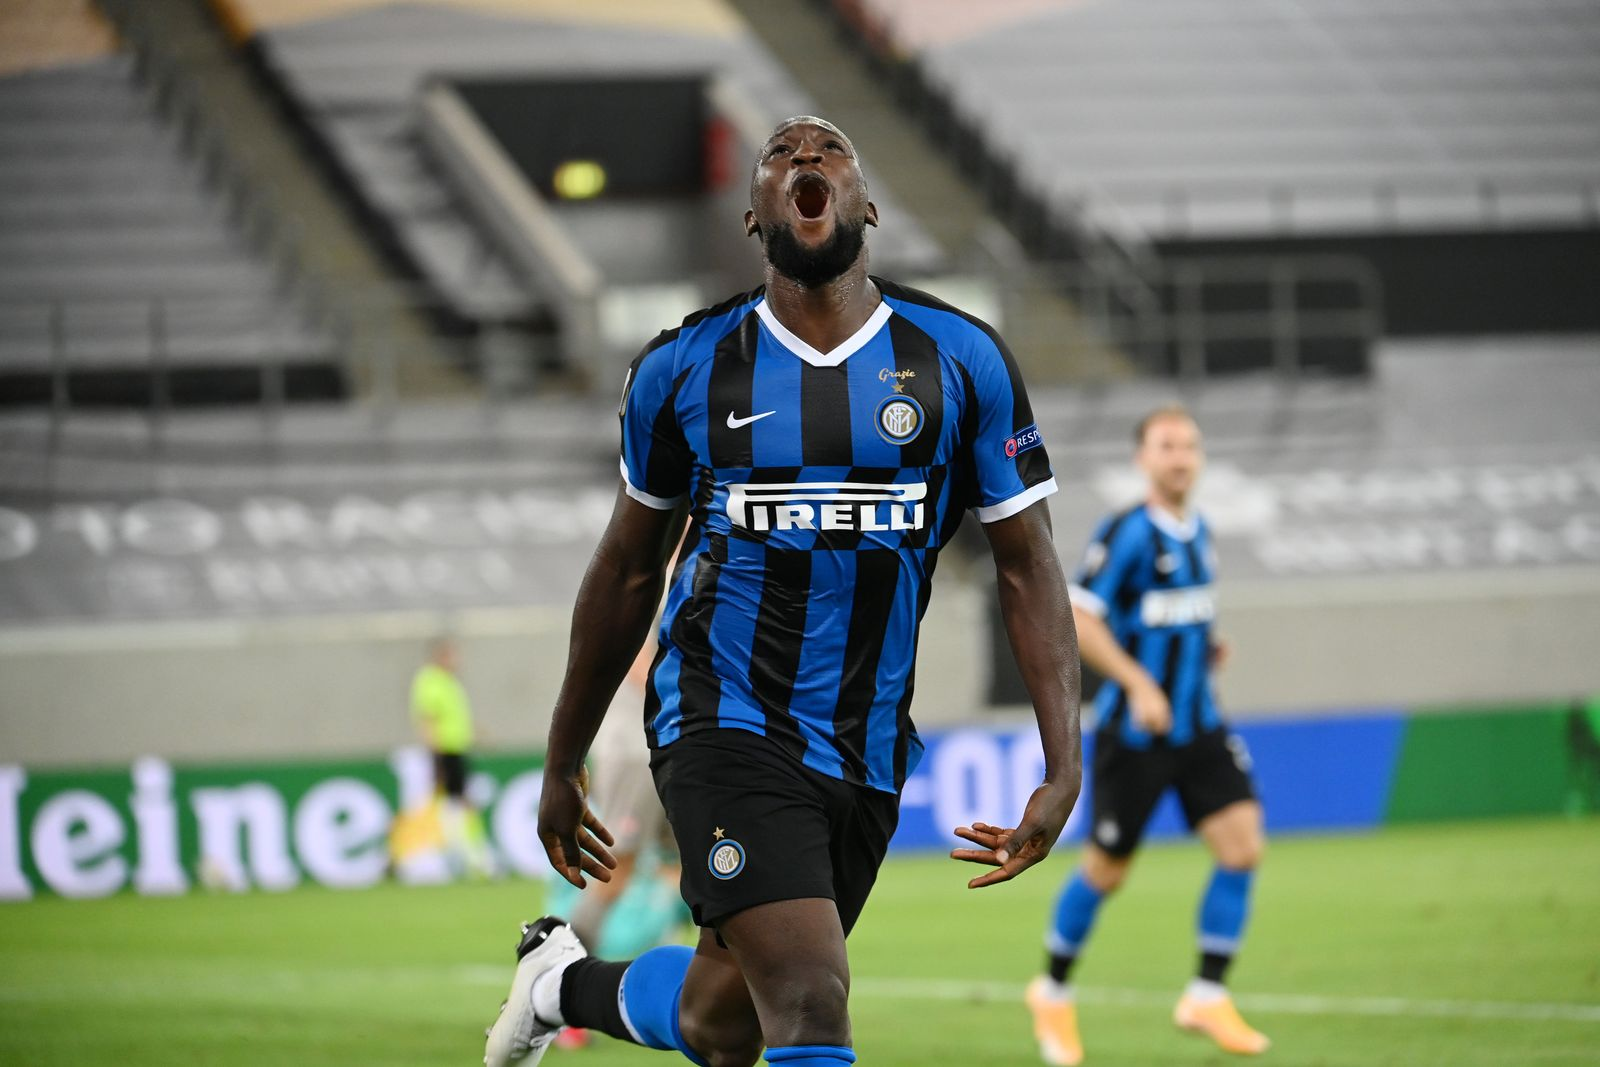 Inter Mailand - Schachtjor Donezk